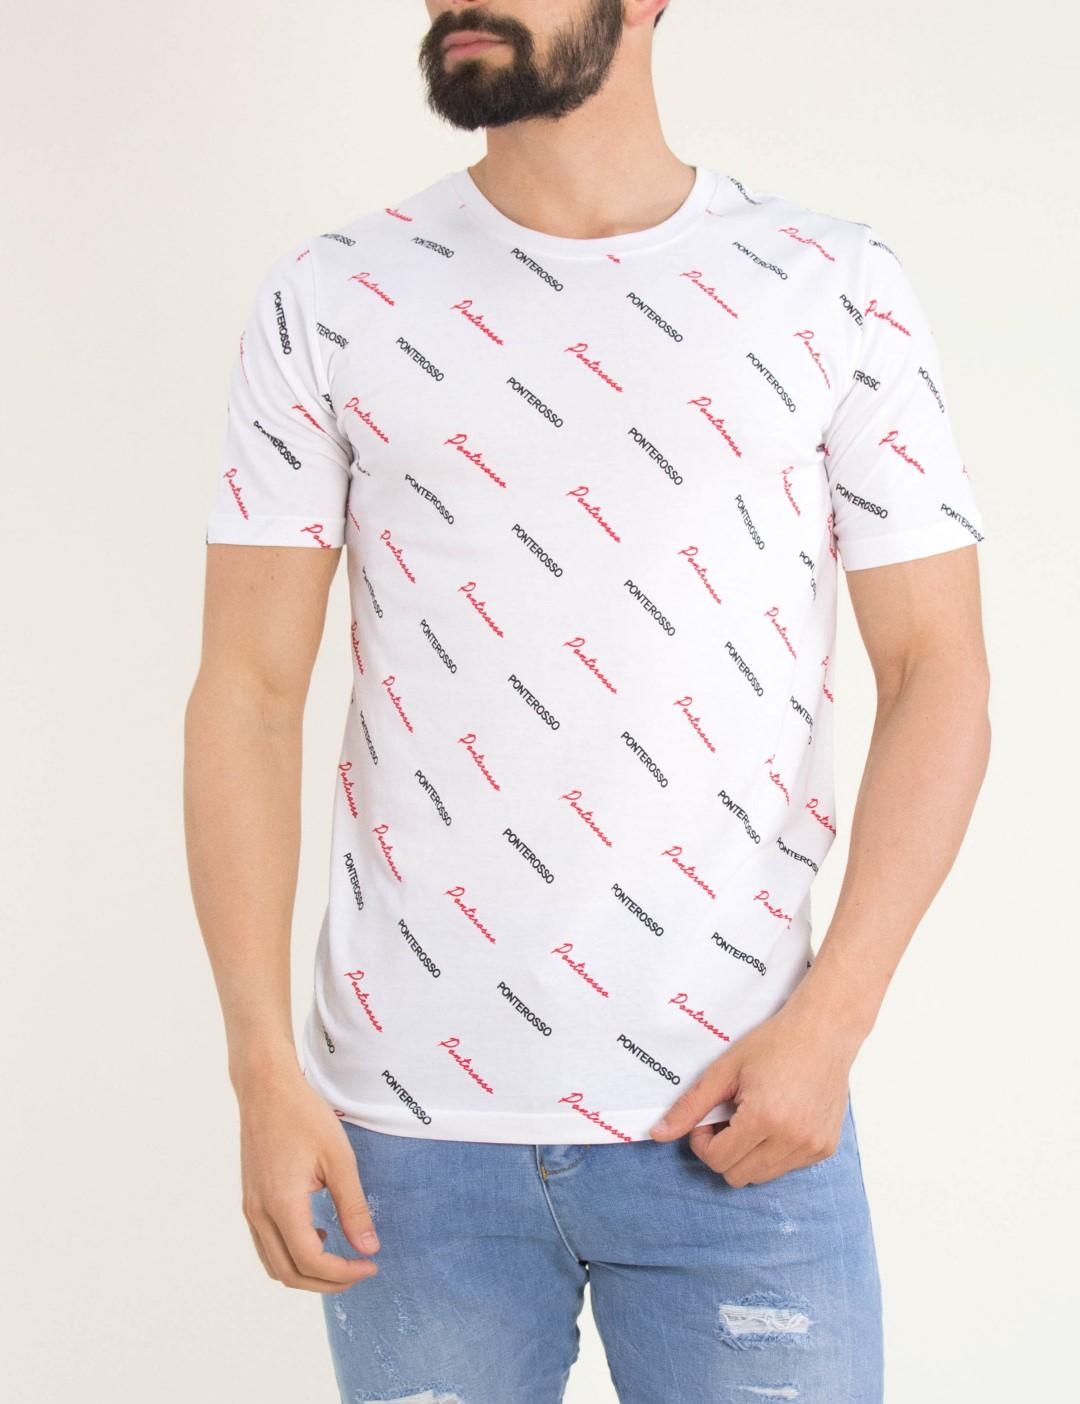 865a19f3a52b Ανδρικό λευκό Tshirt τυπώματα Ponte rosso 191020